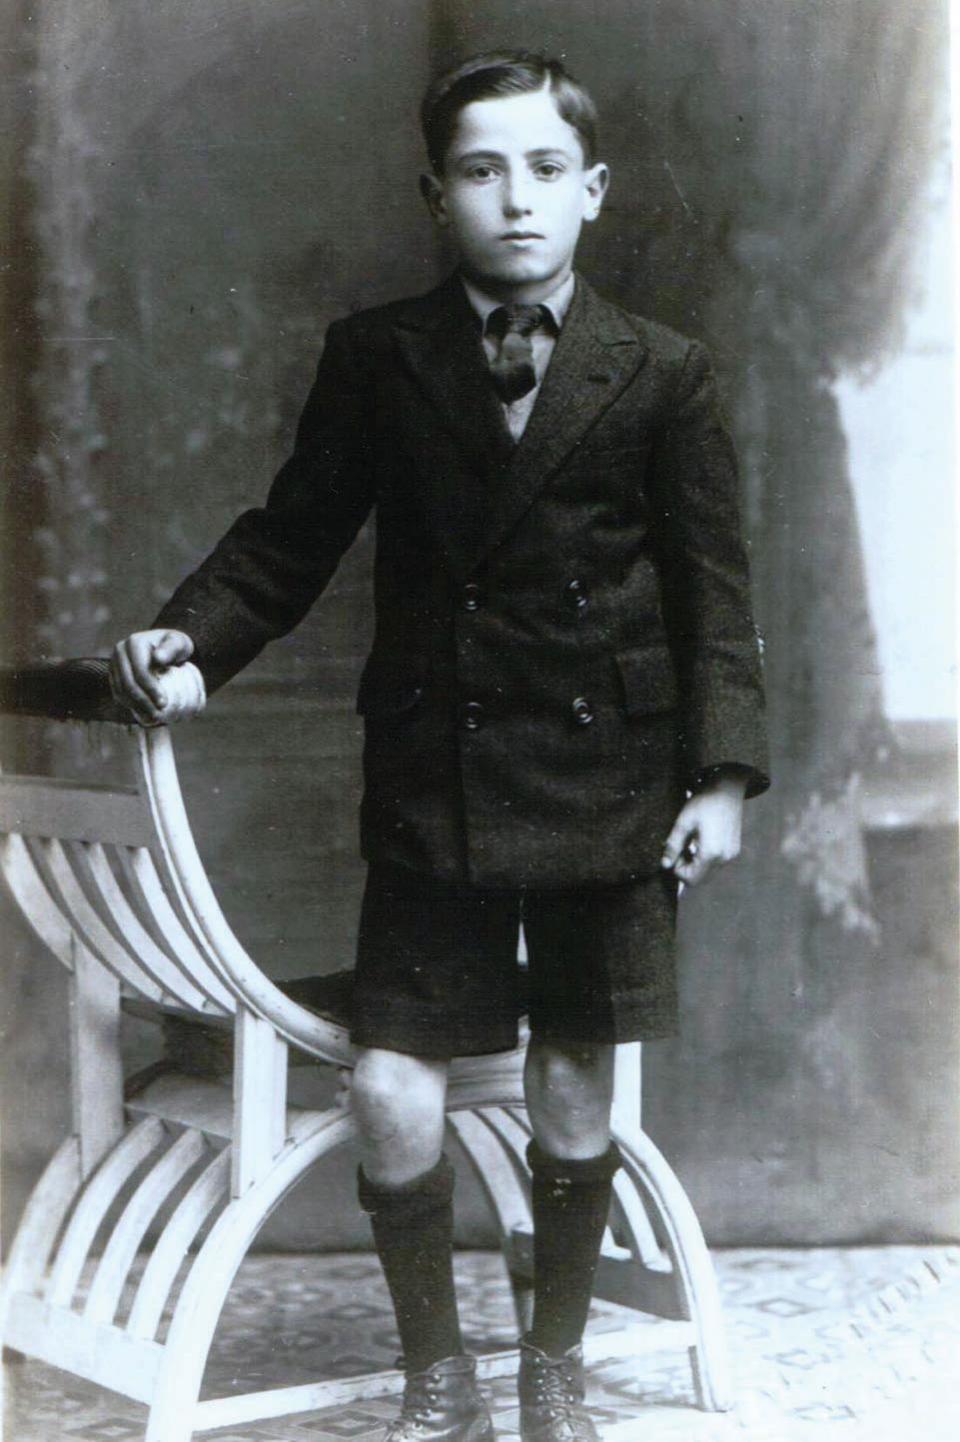 Dimech circa nine years old in 1870.